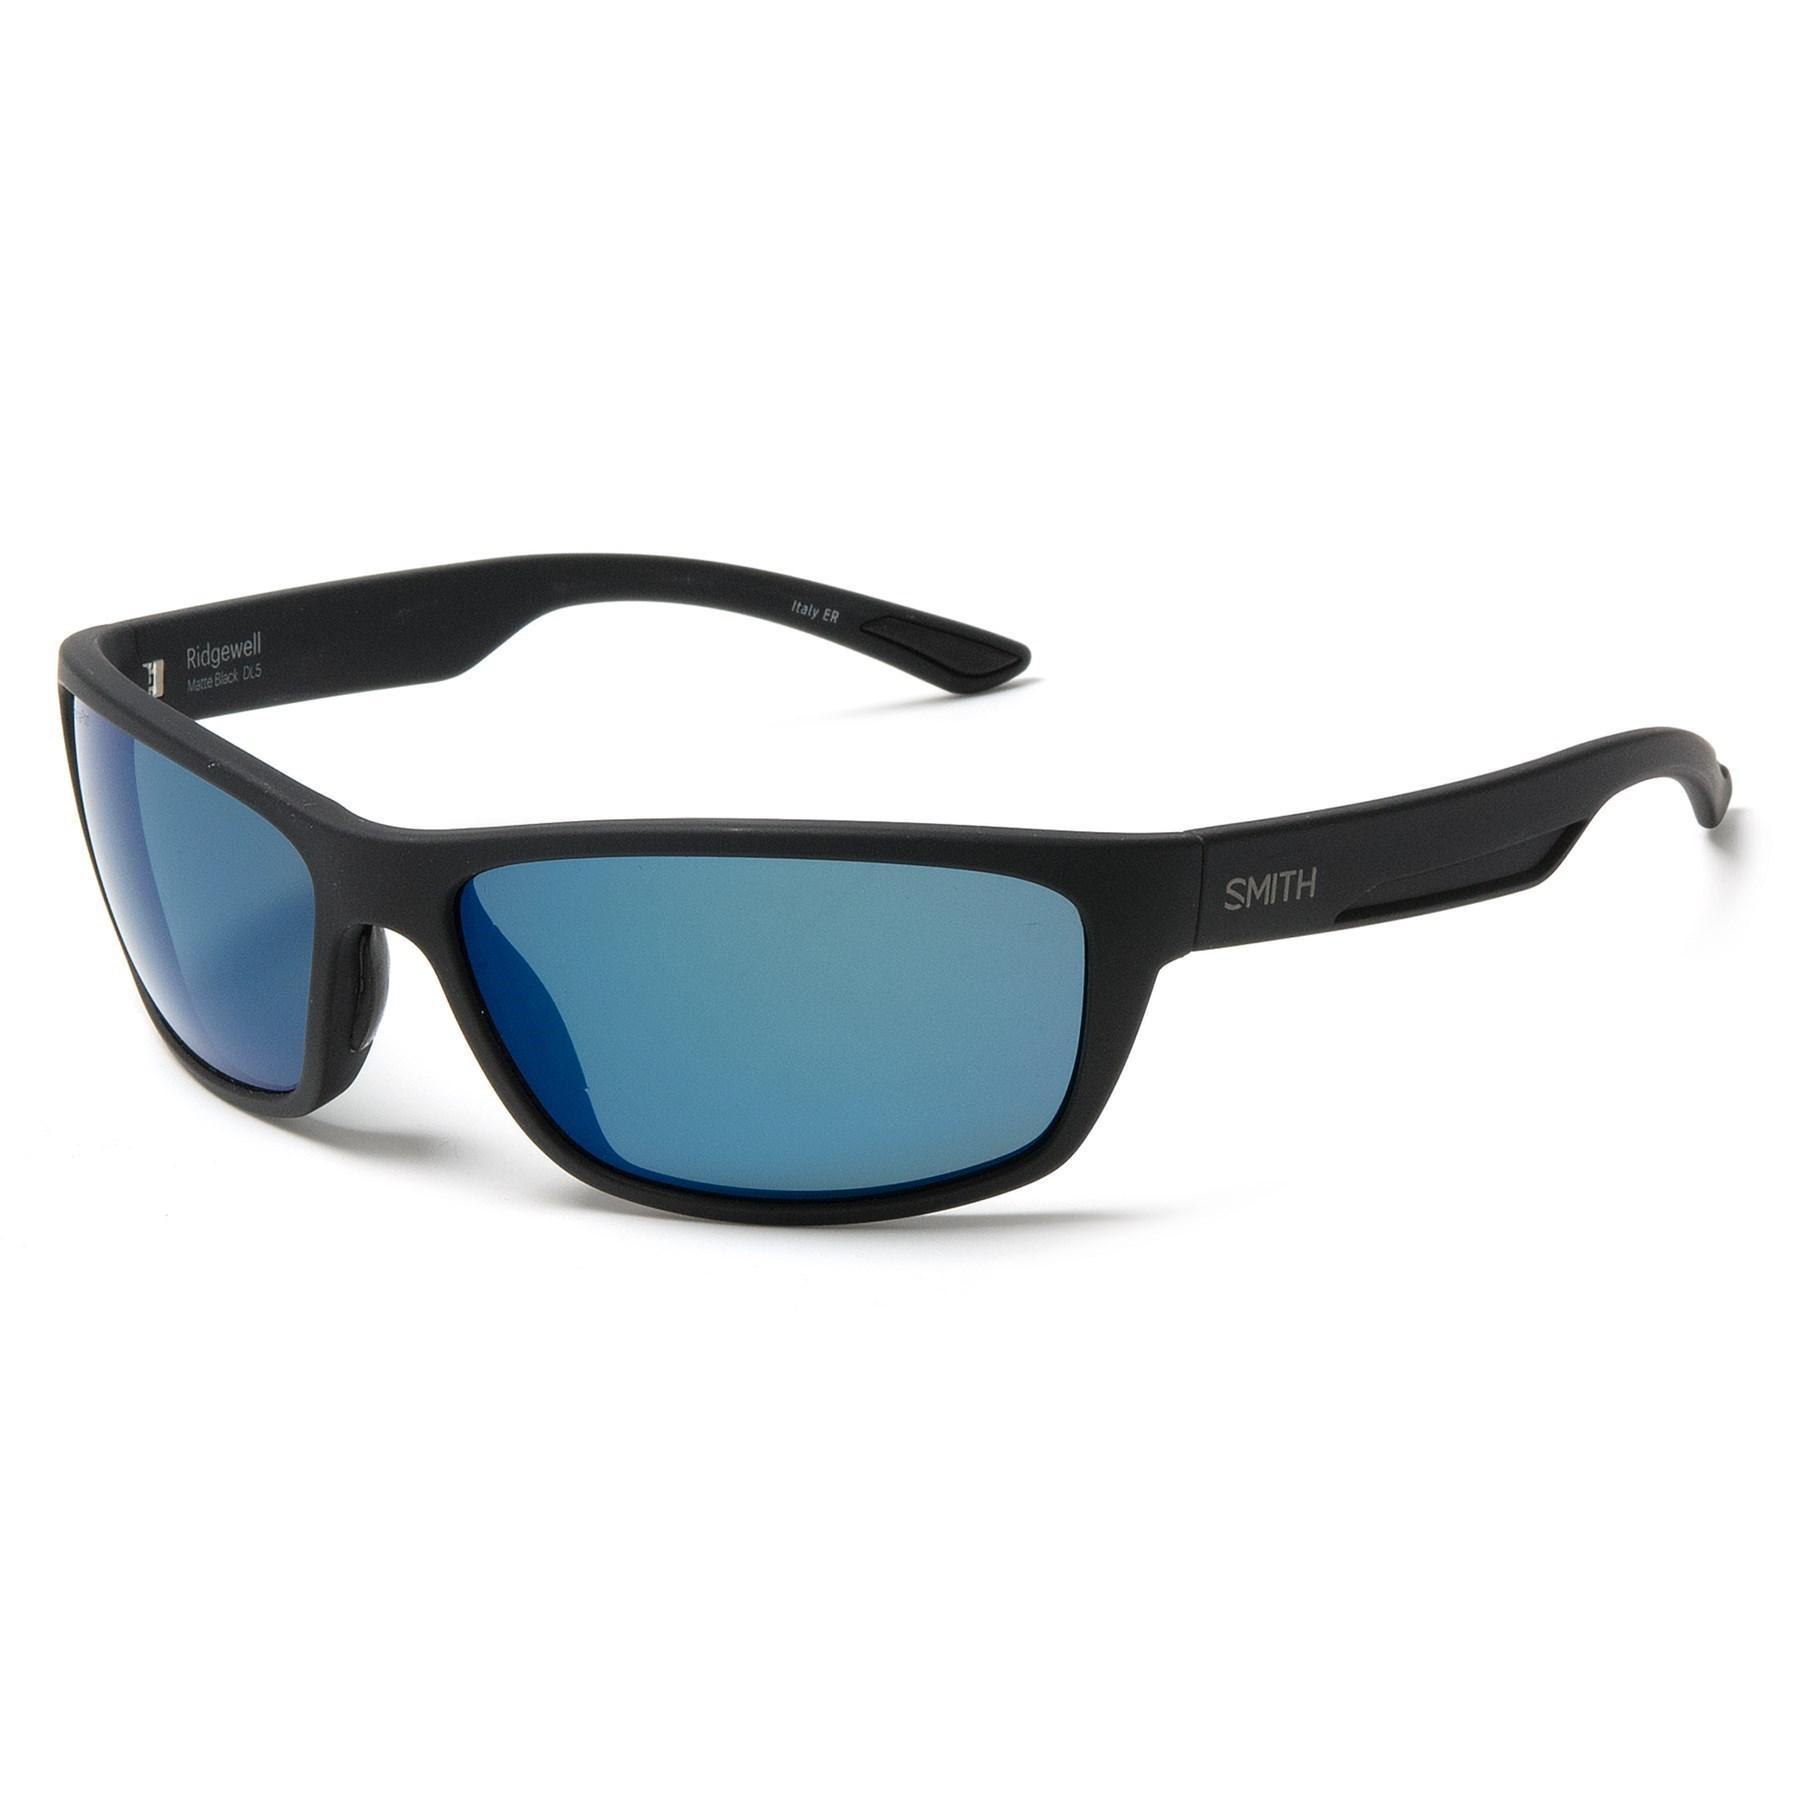 50a41e710932b Lyst - Smith Optics Ridgewell Sunglasses in Blue for Men